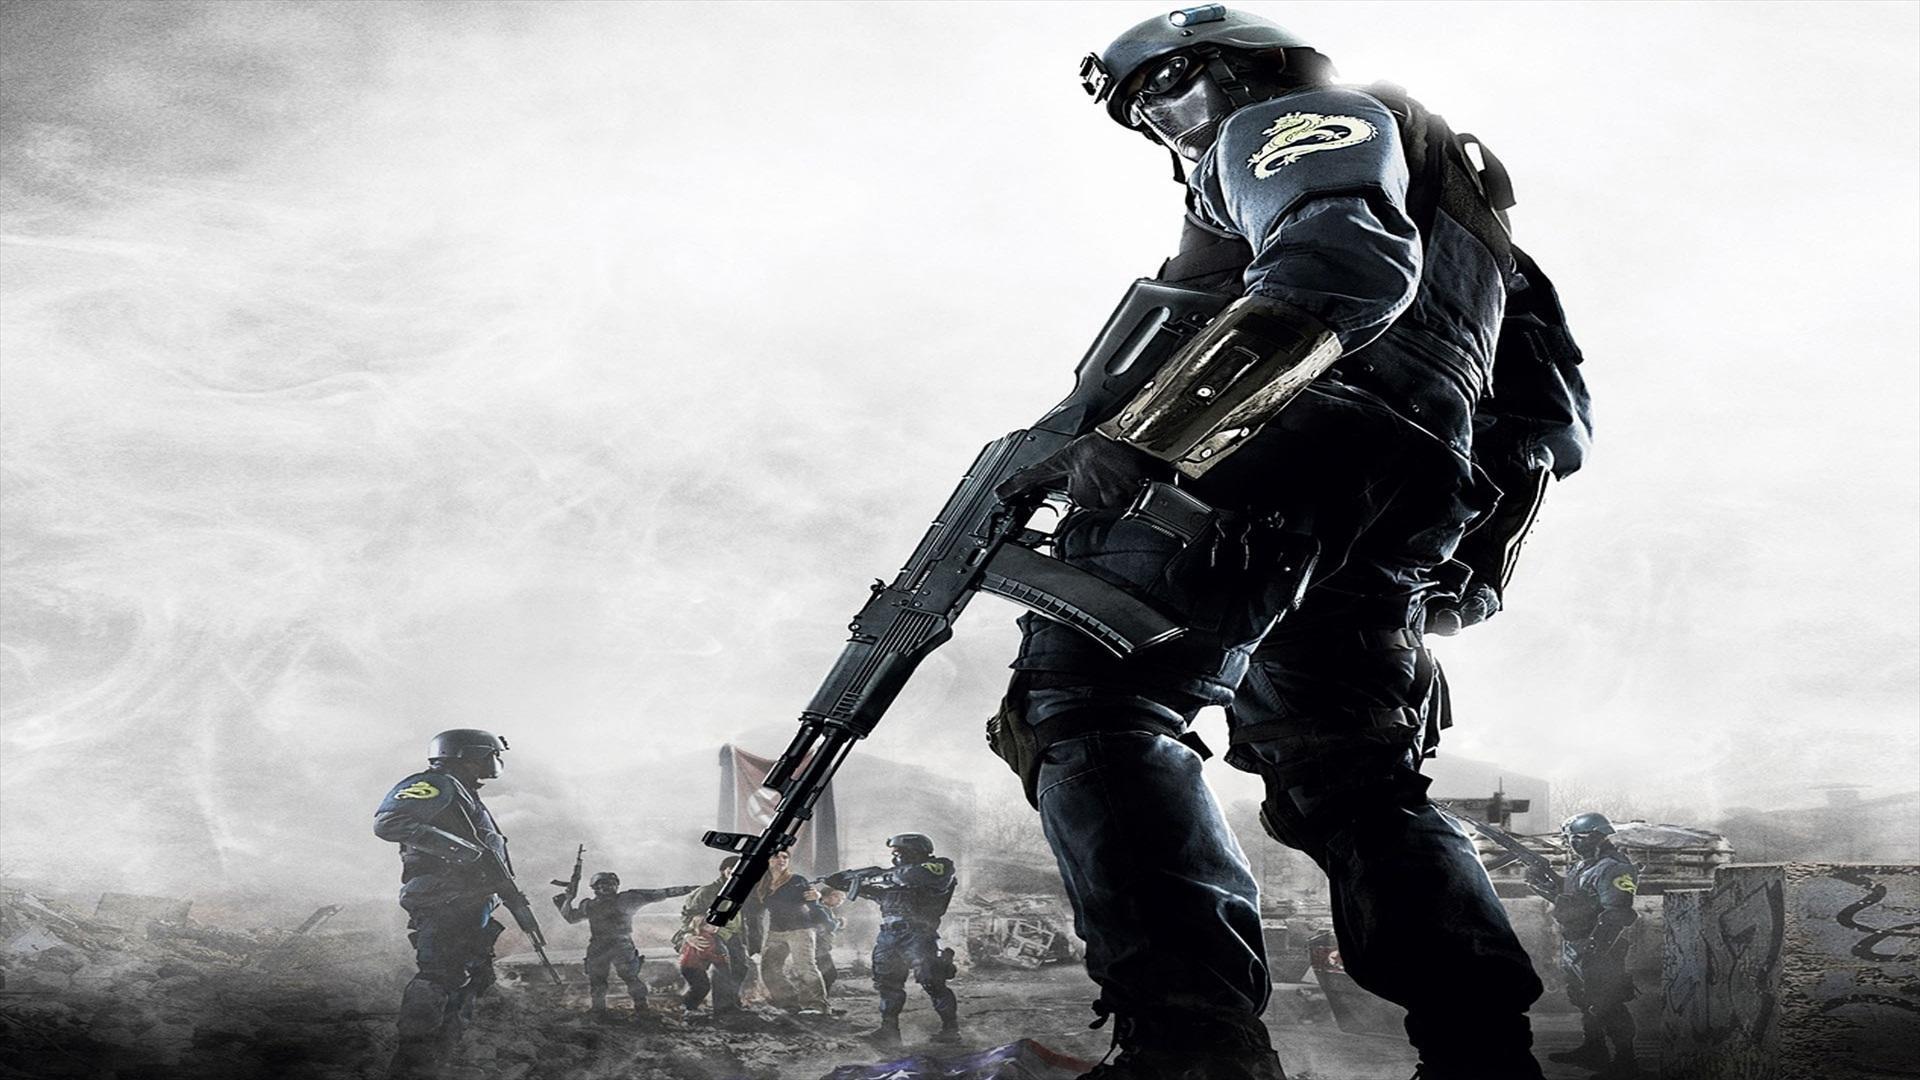 Counter Strike wallpaper background 1920x1080